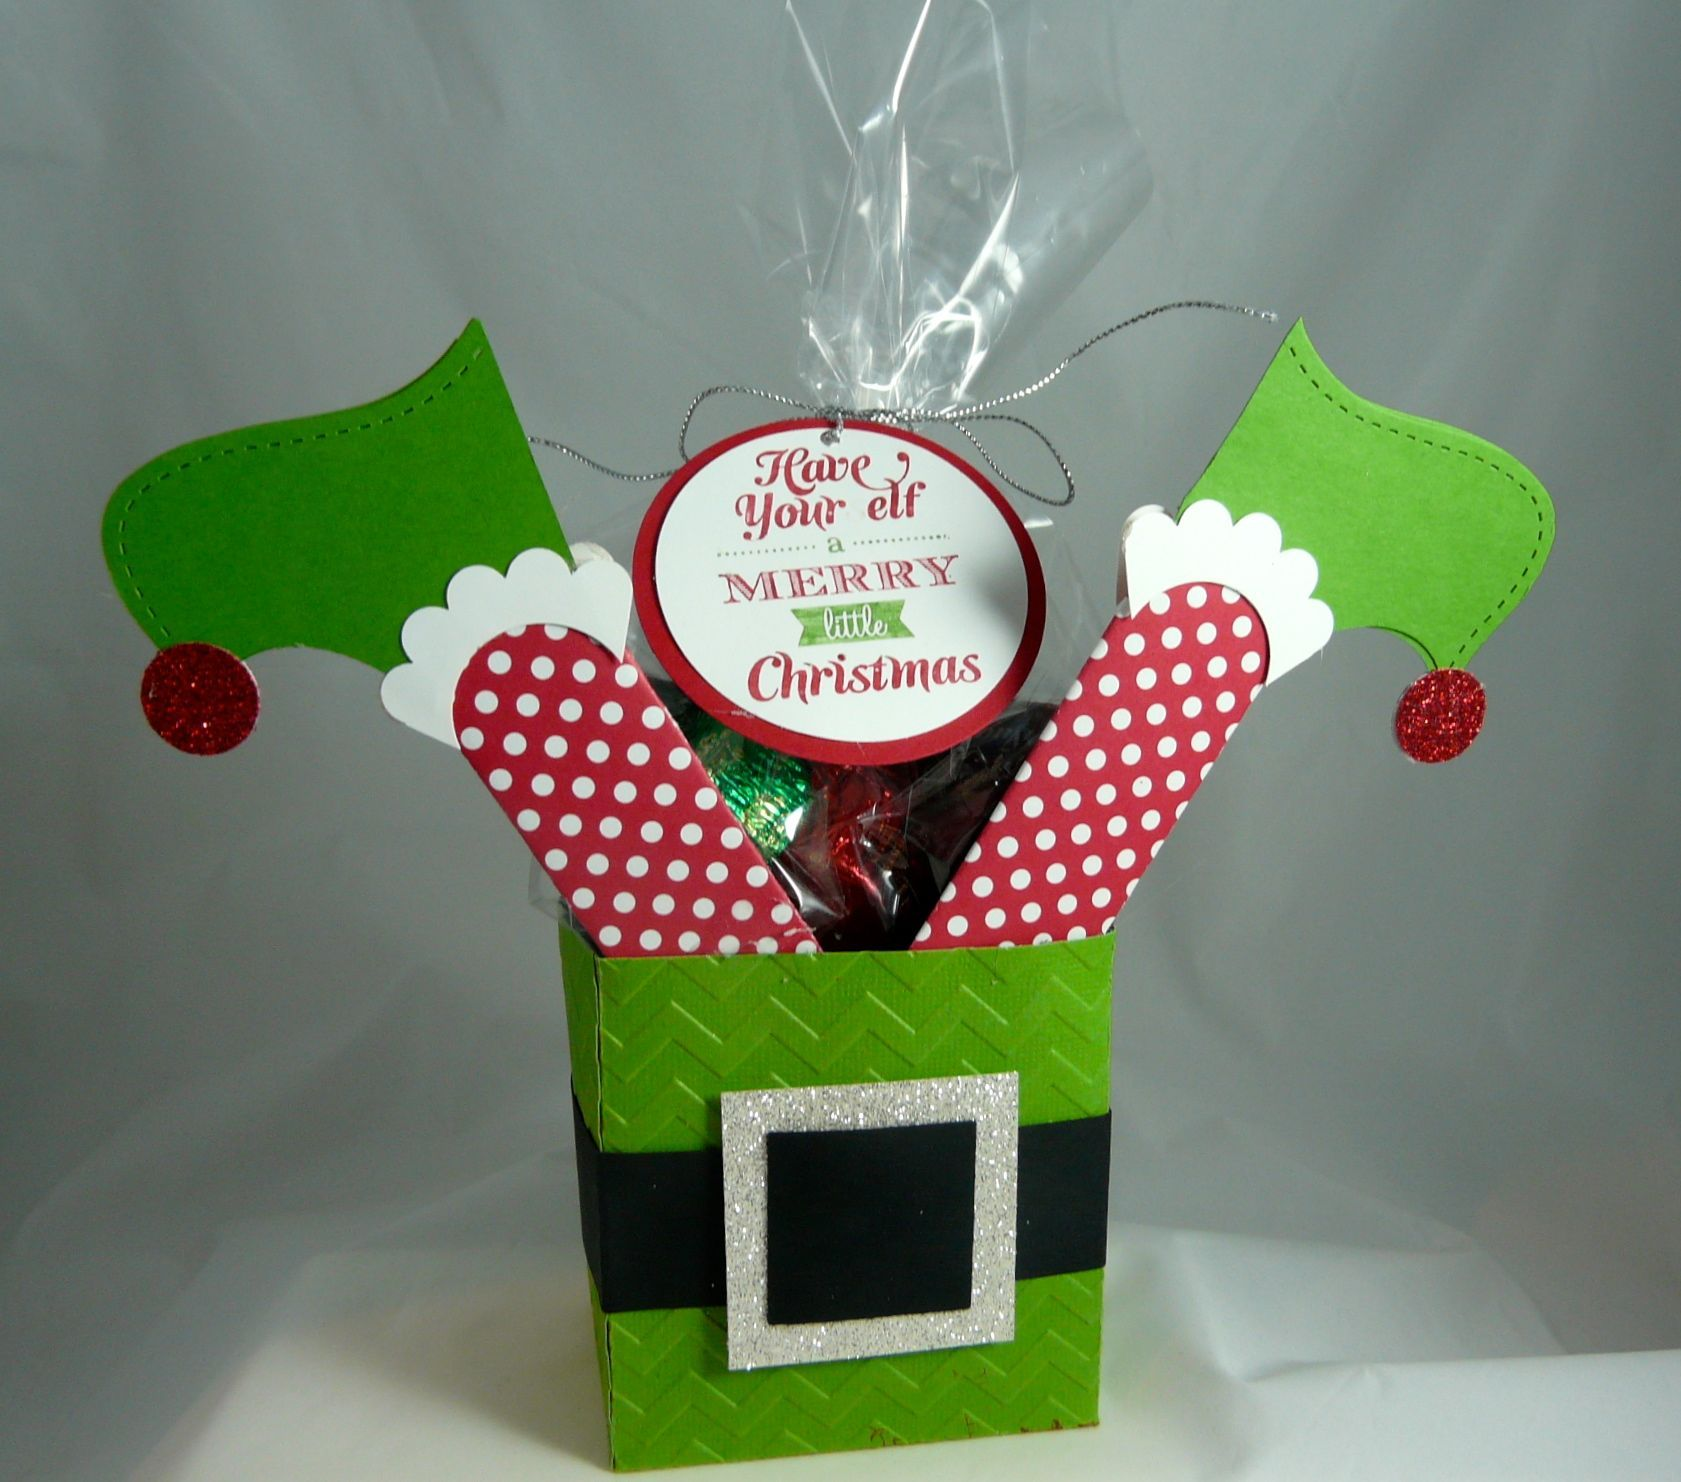 bo te pour offrir des chocolats manualidades pinterest navidad dulceros y cajas. Black Bedroom Furniture Sets. Home Design Ideas